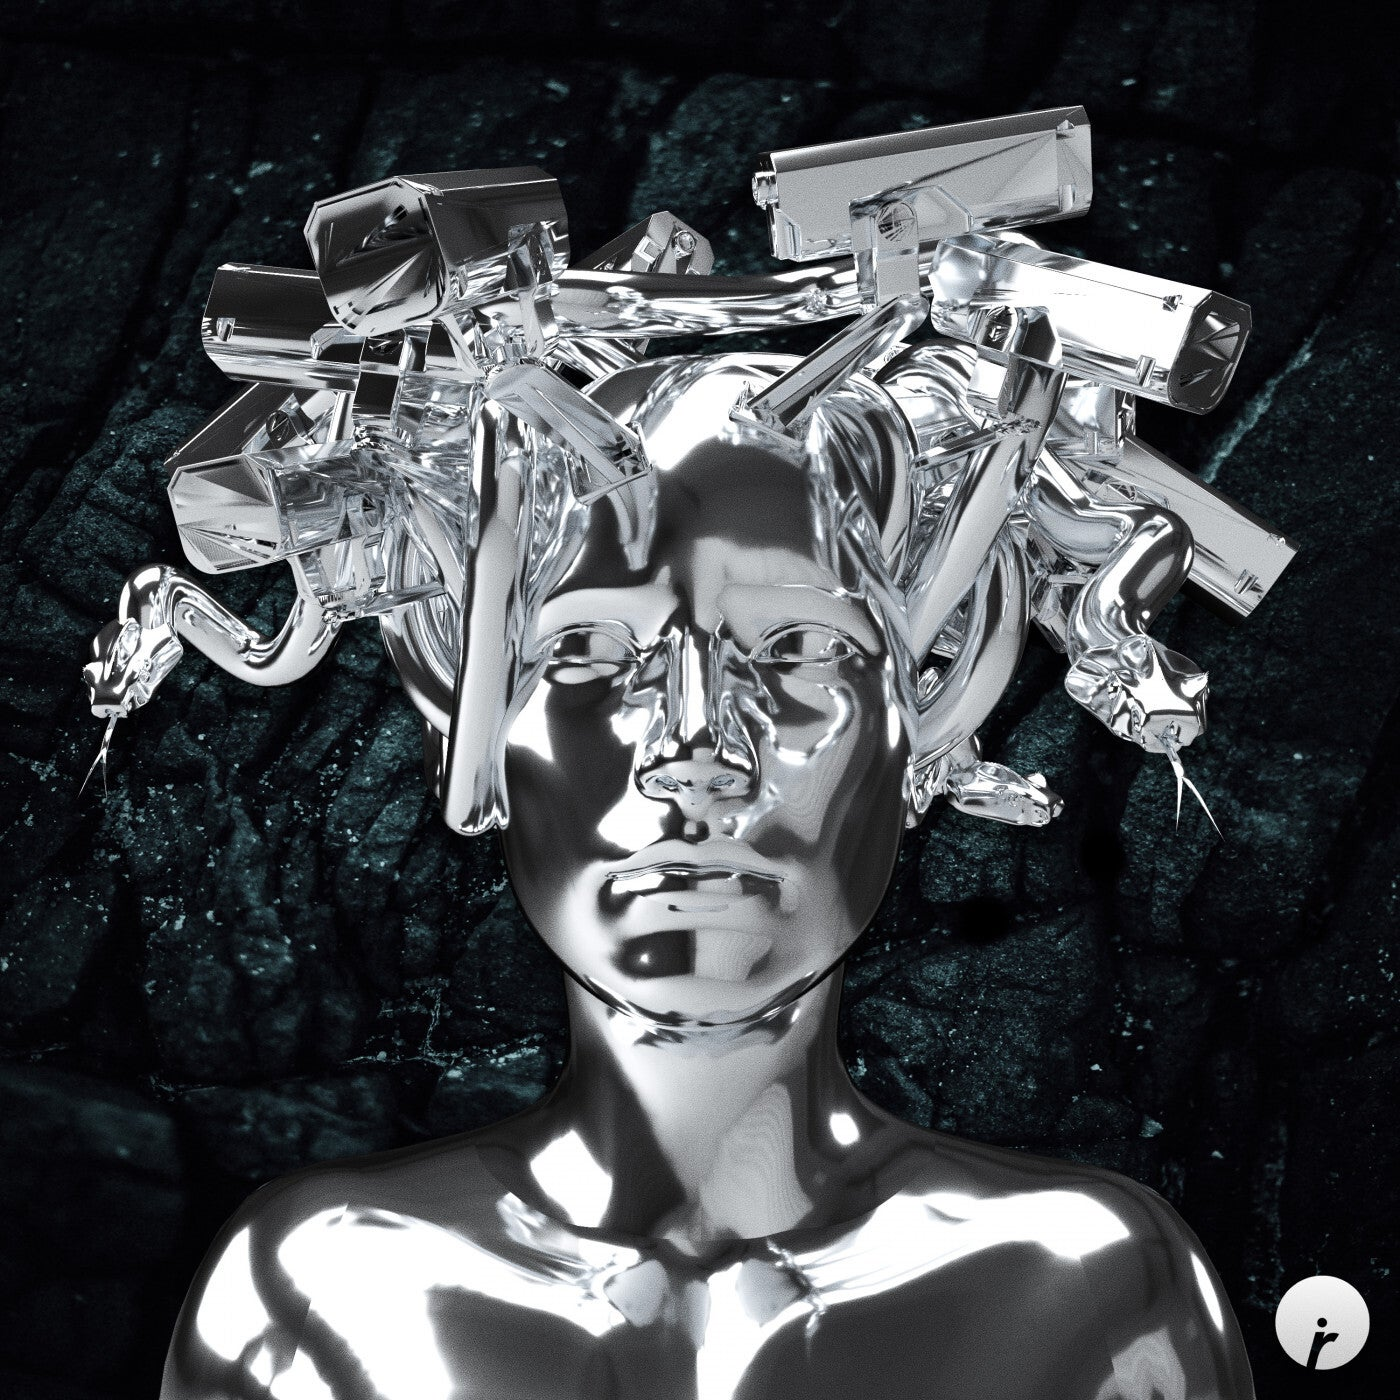 Headrush (feat. Elroii) (Extended Mix)